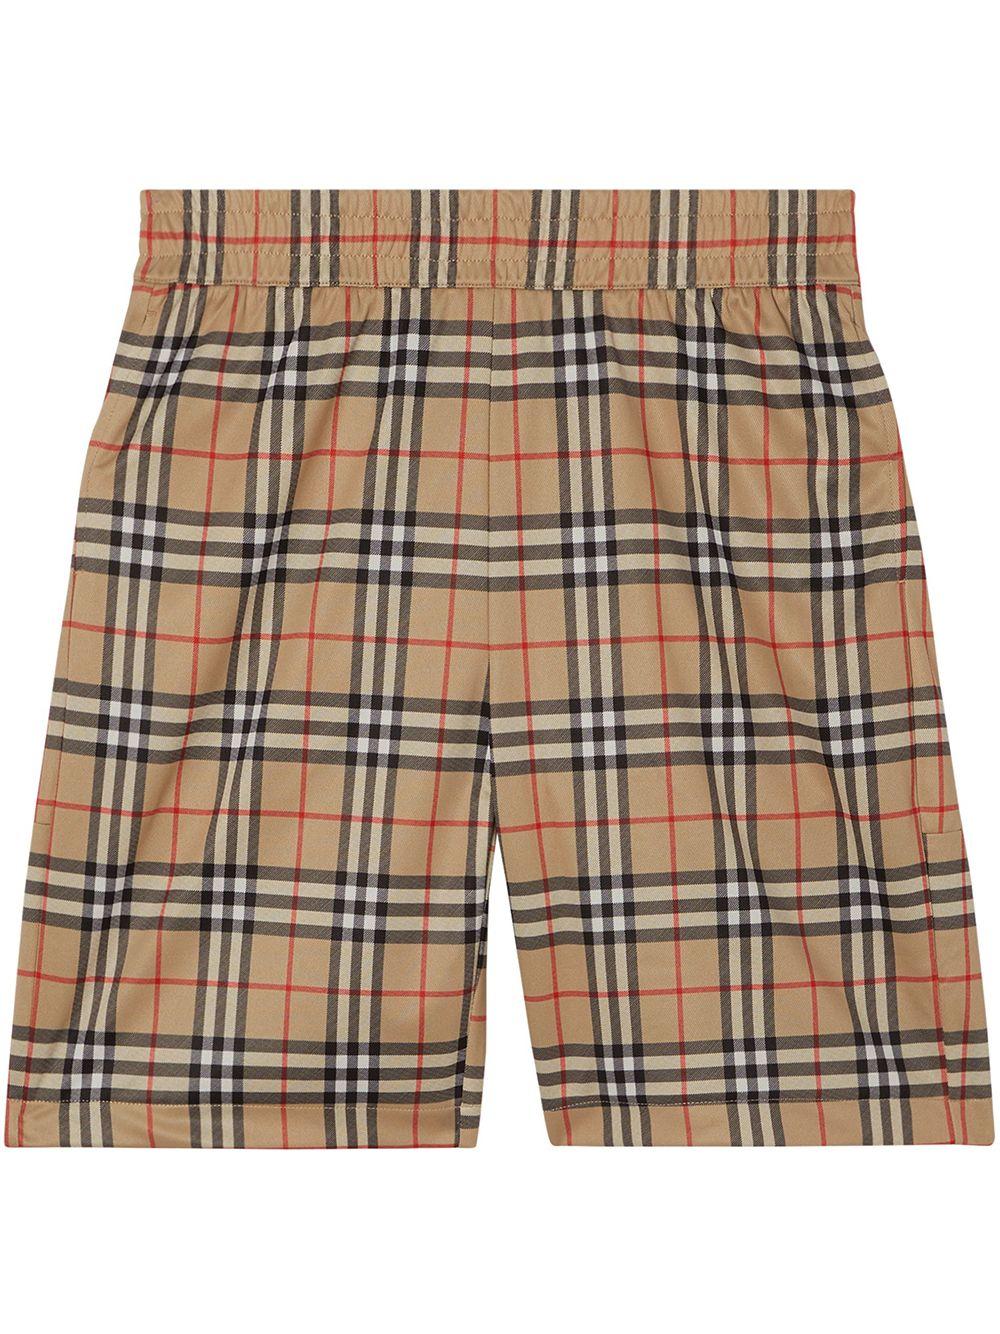 Burberry Karierte Shorts - Nude